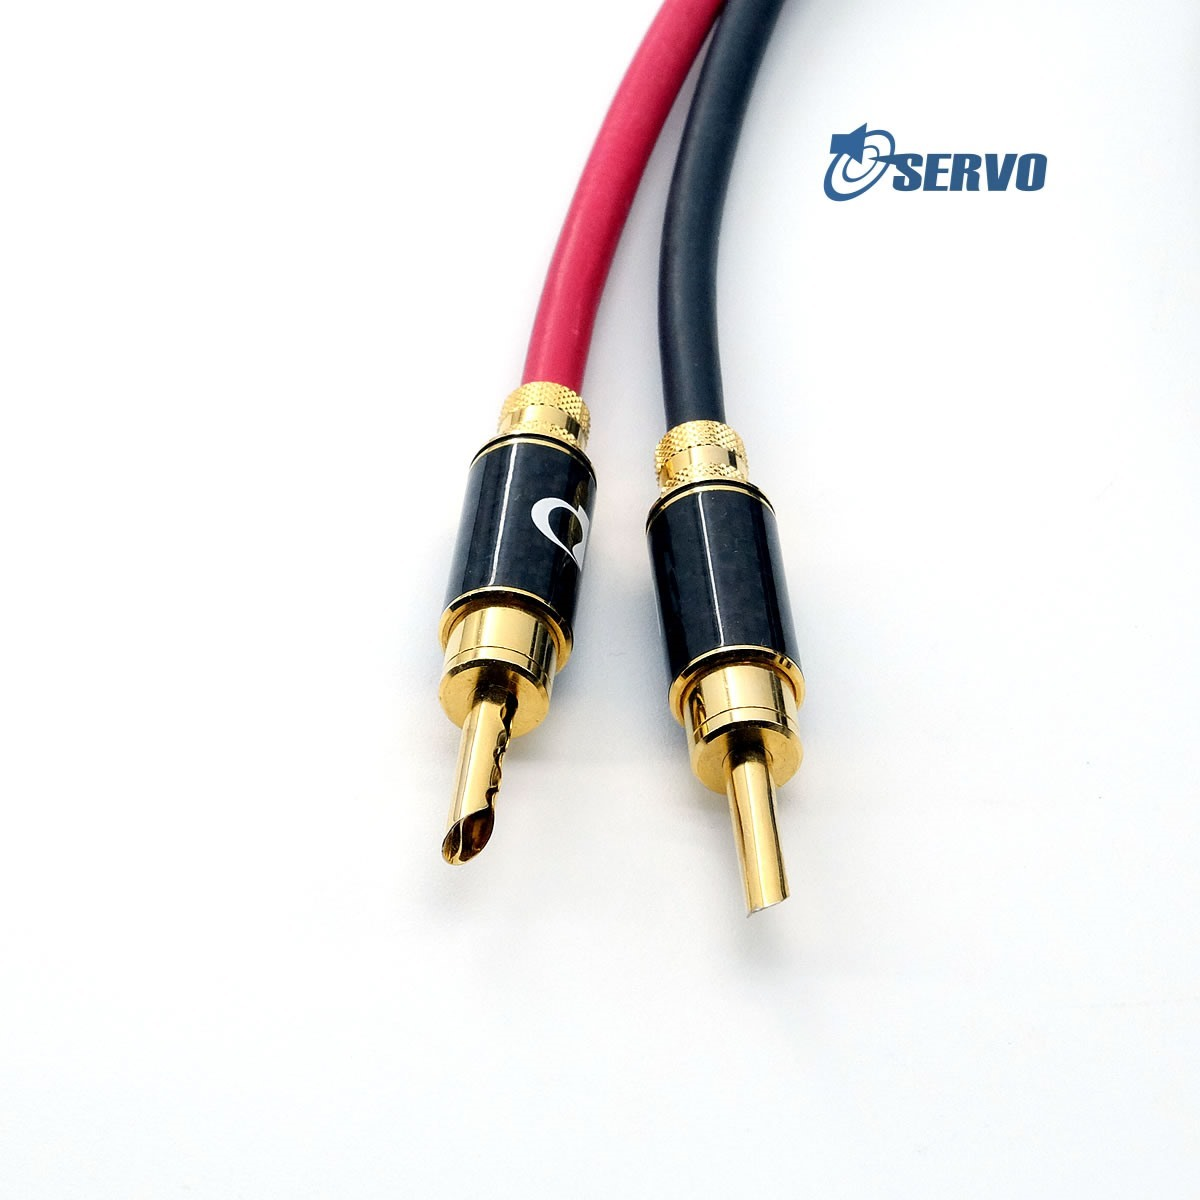 Musaeus 3.0 akustiskais kabelis - Servo.lv